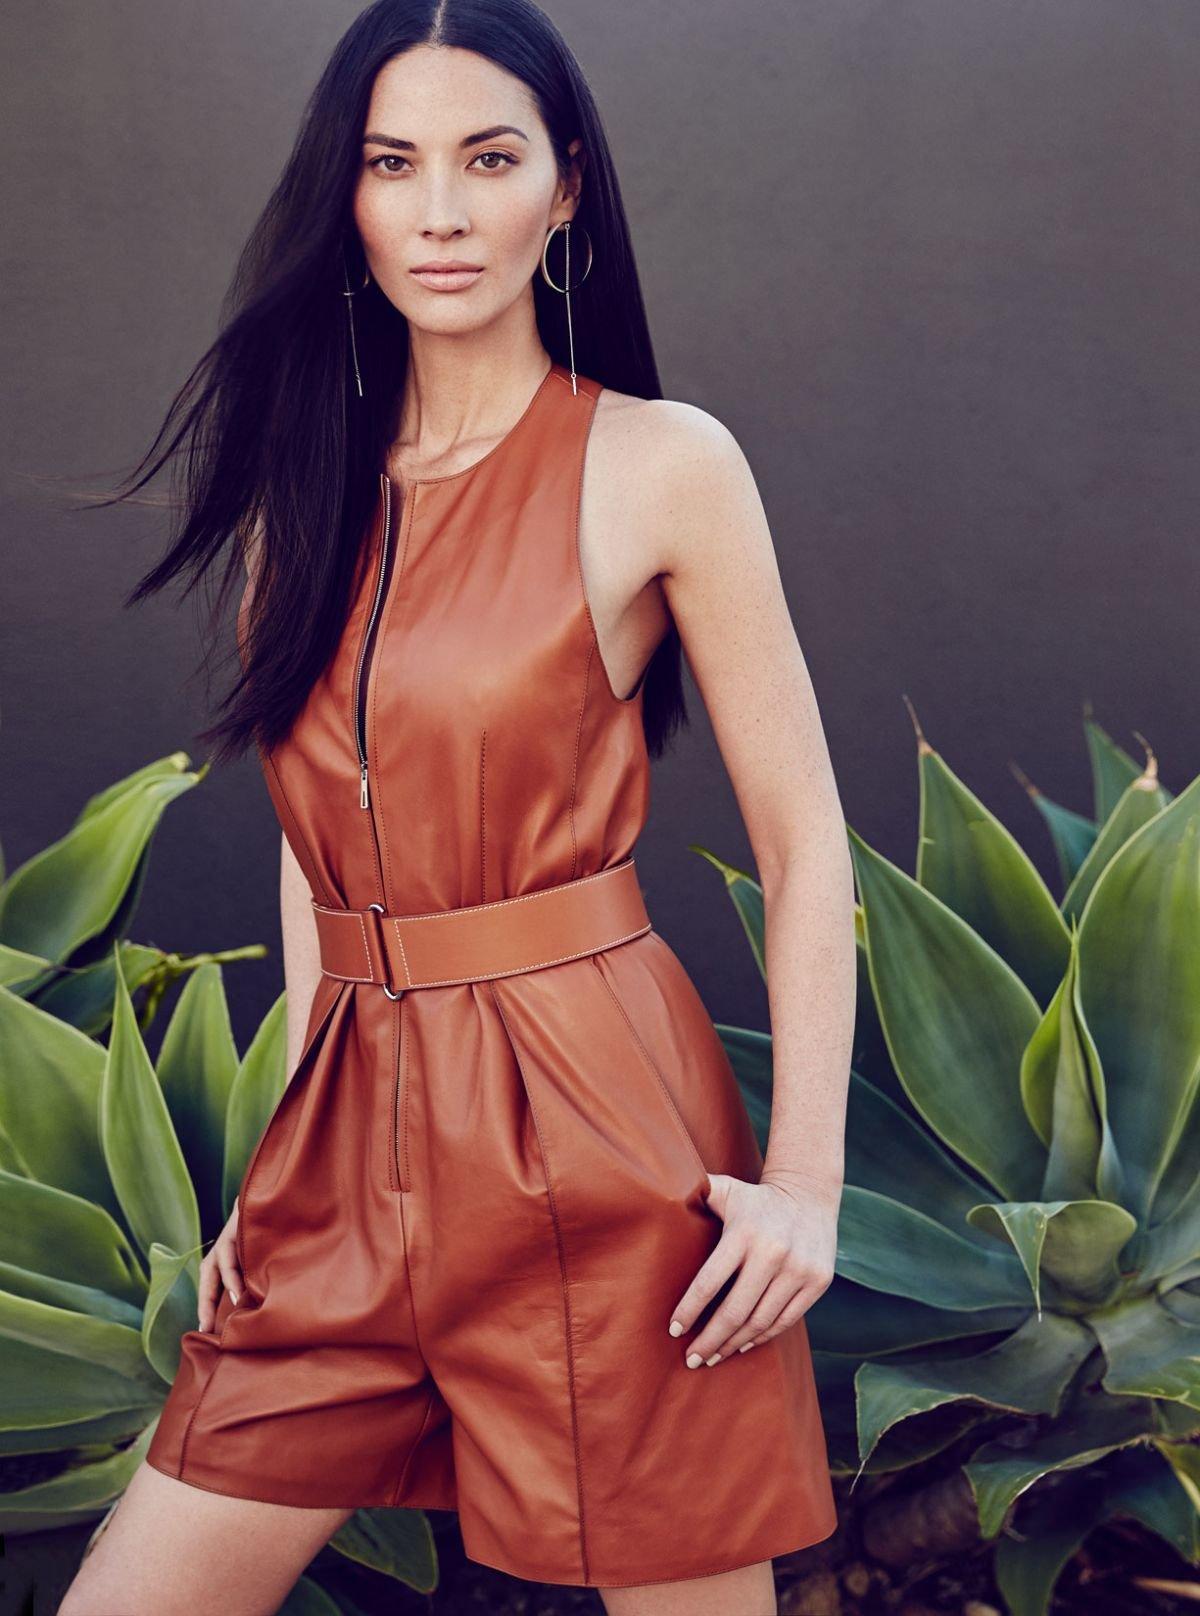 Оливия Манн украсила собою обложку журнала Fashion